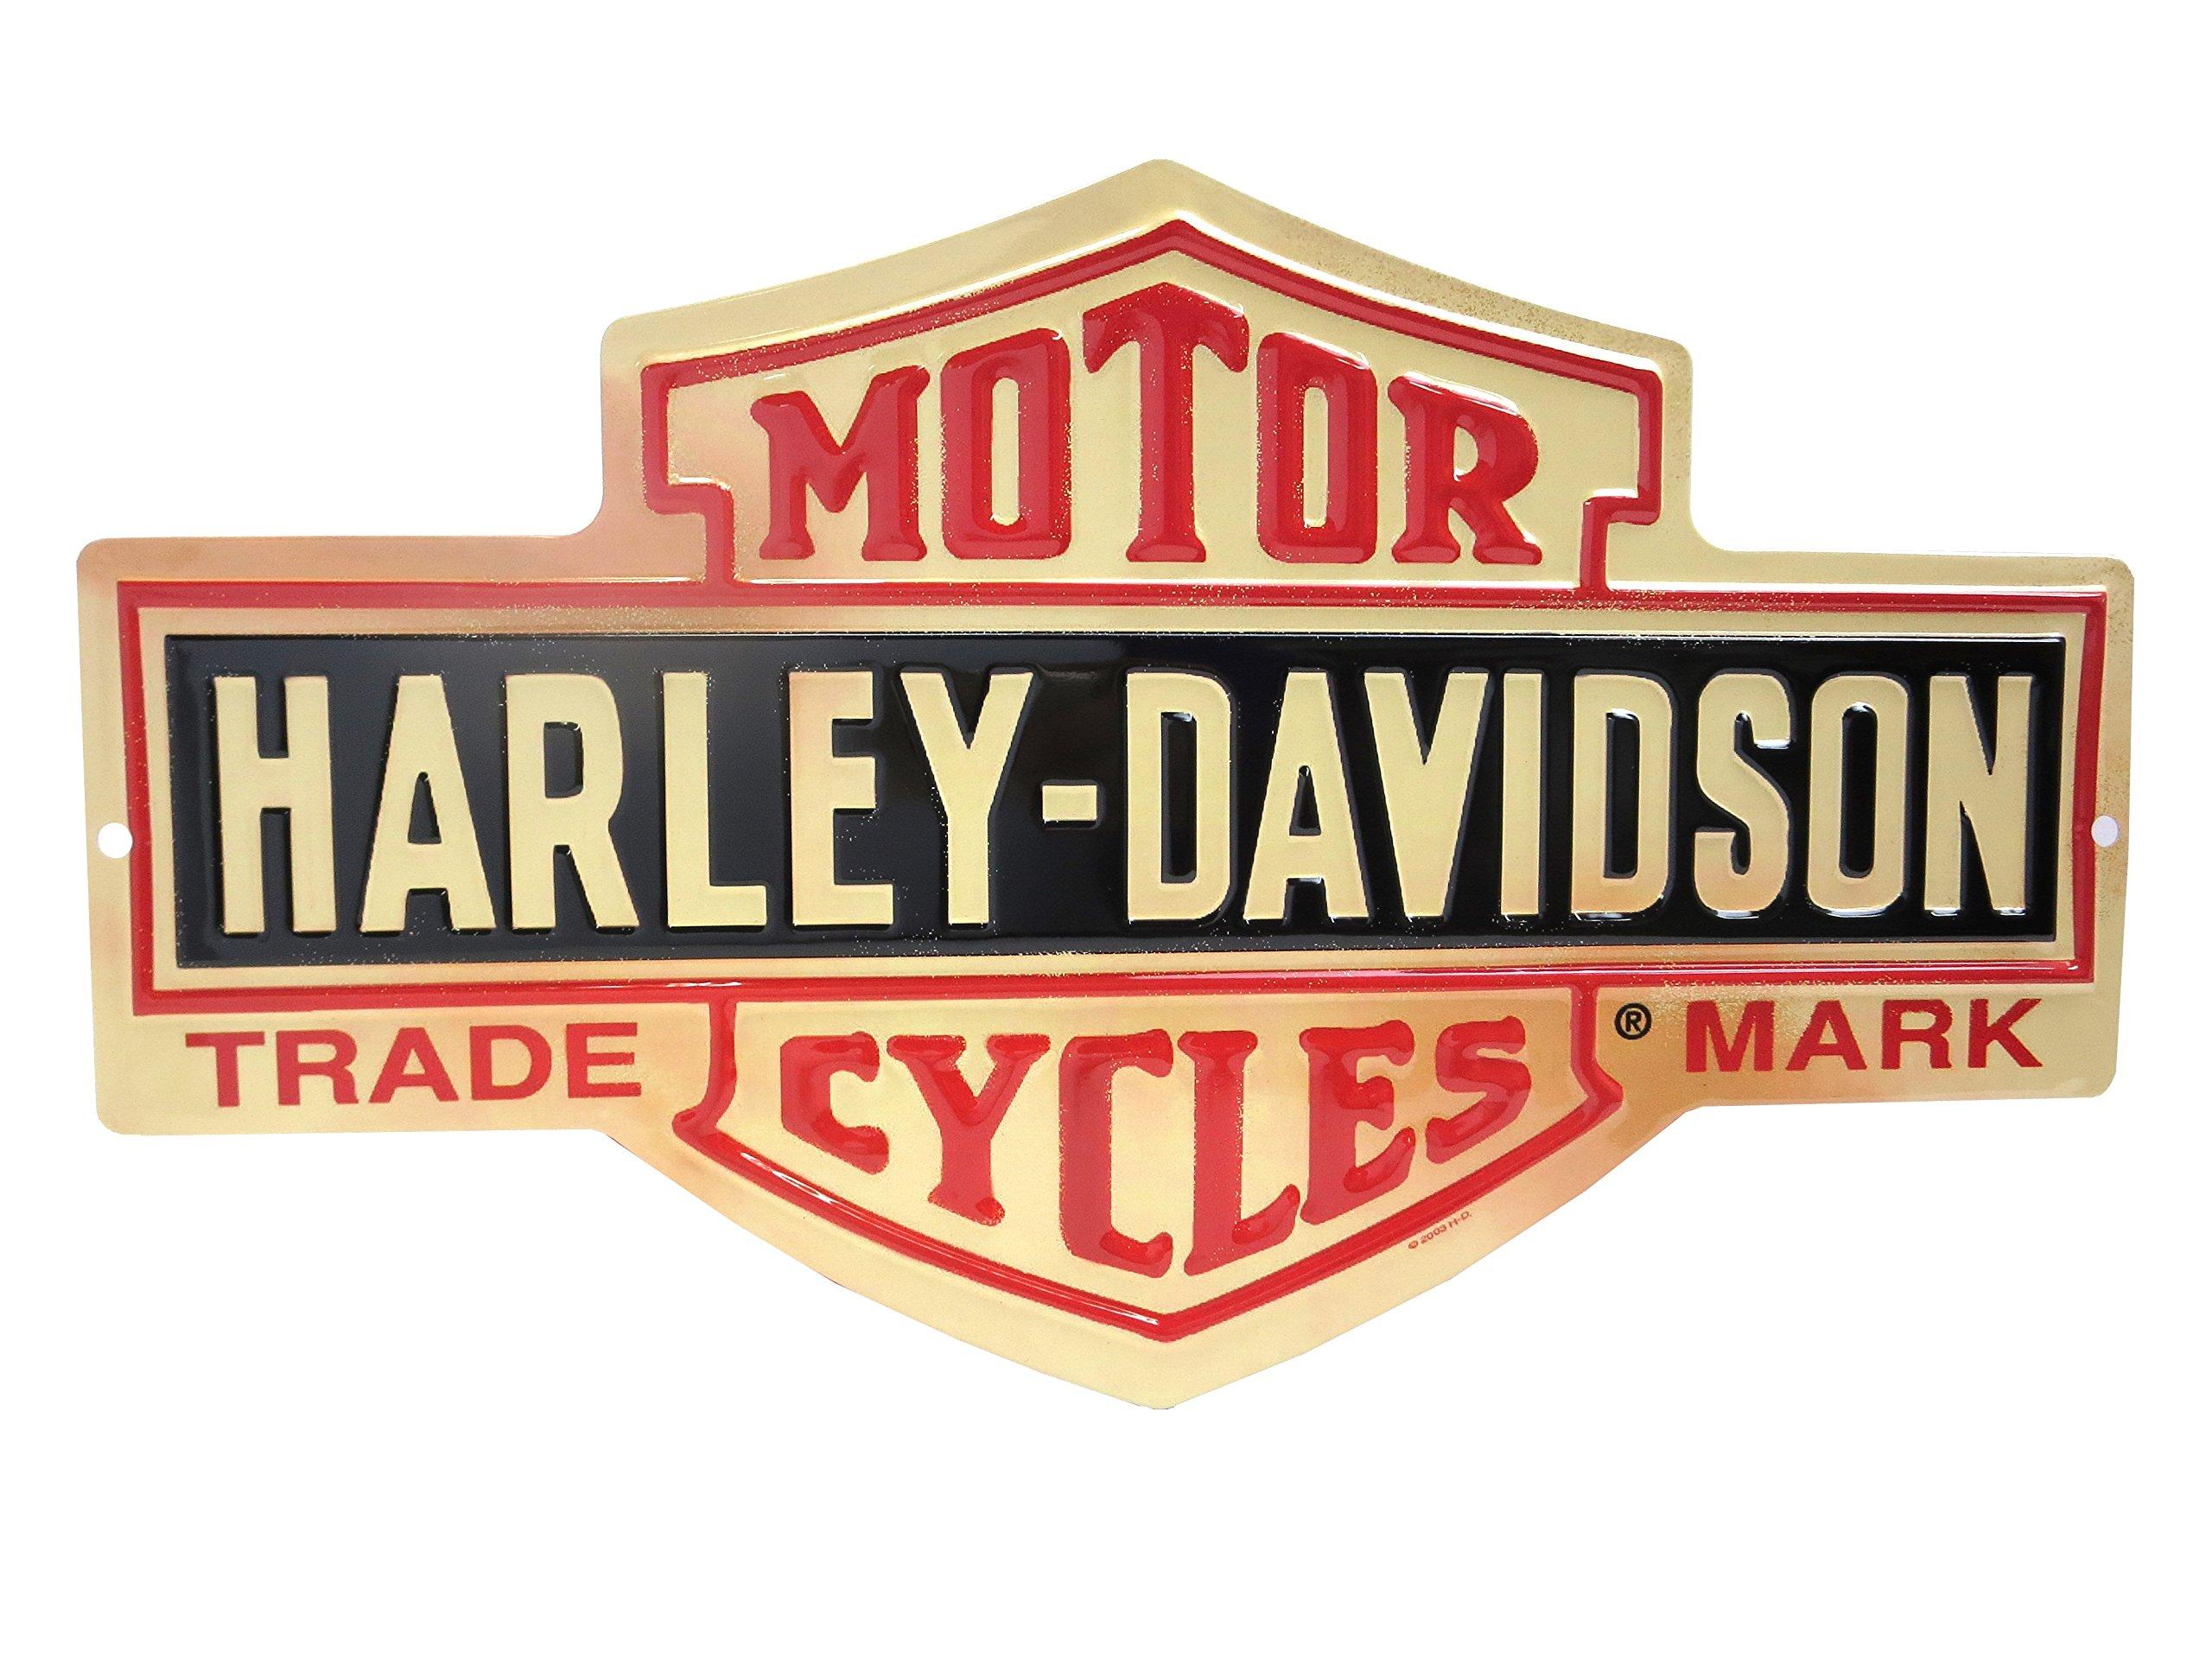 Harley-Davidson Bar and Shield Metal Sign by Harley-Davidson